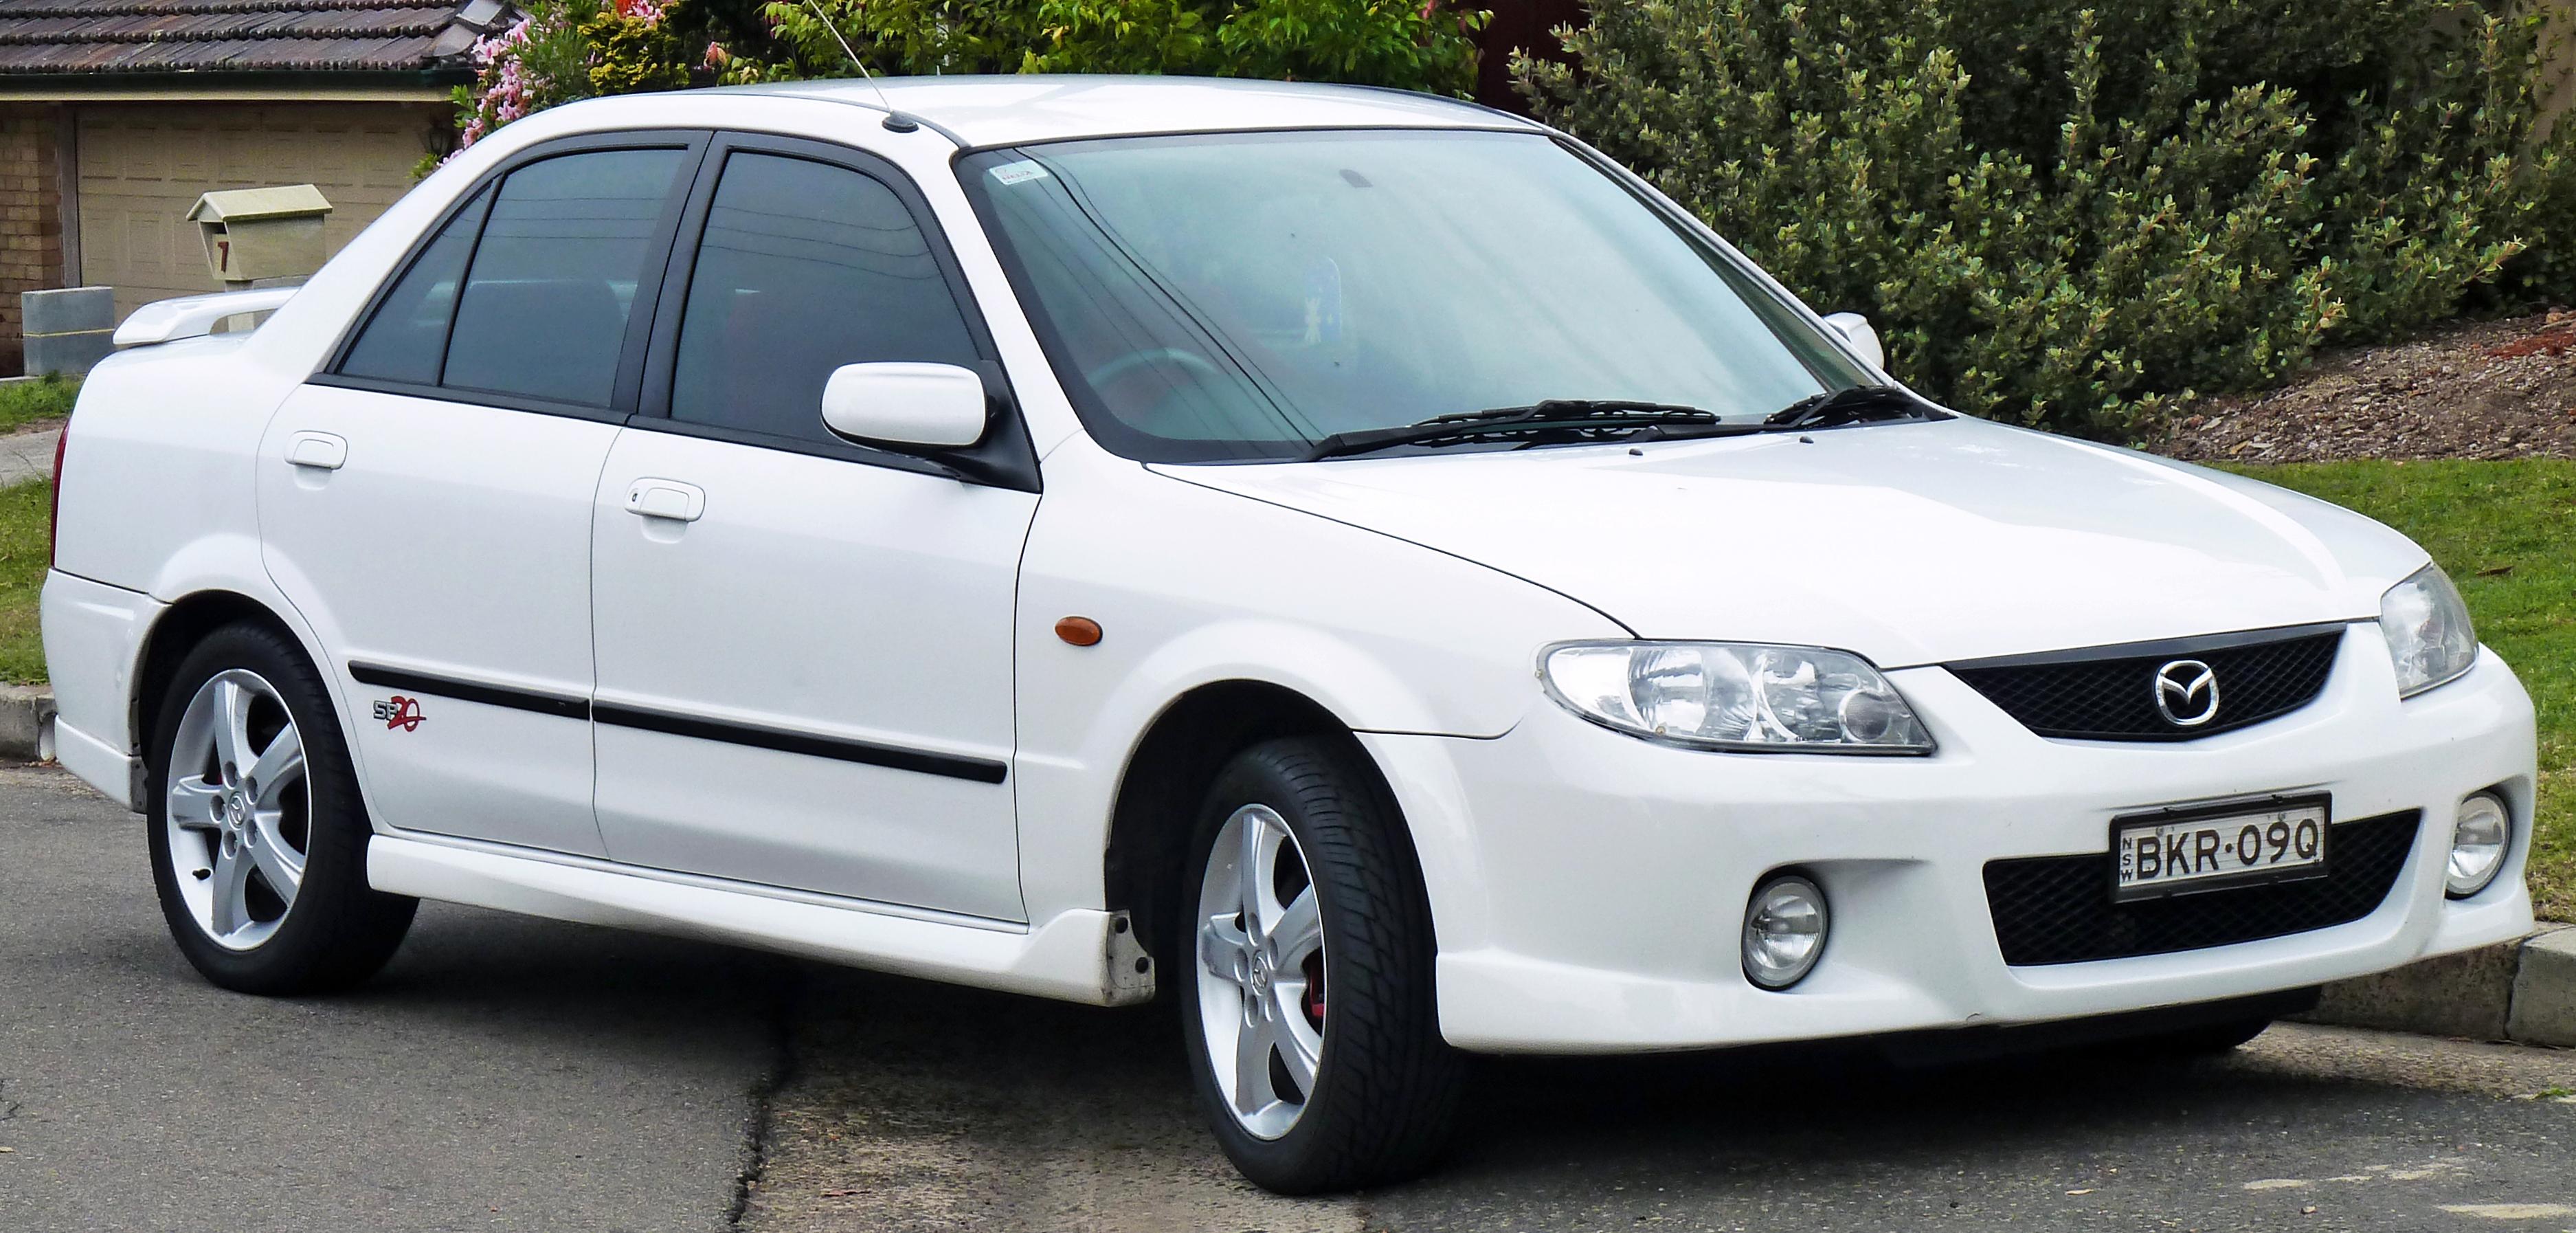 Mazda Protege III (BJ) 1998 - 2004 Sedan #2